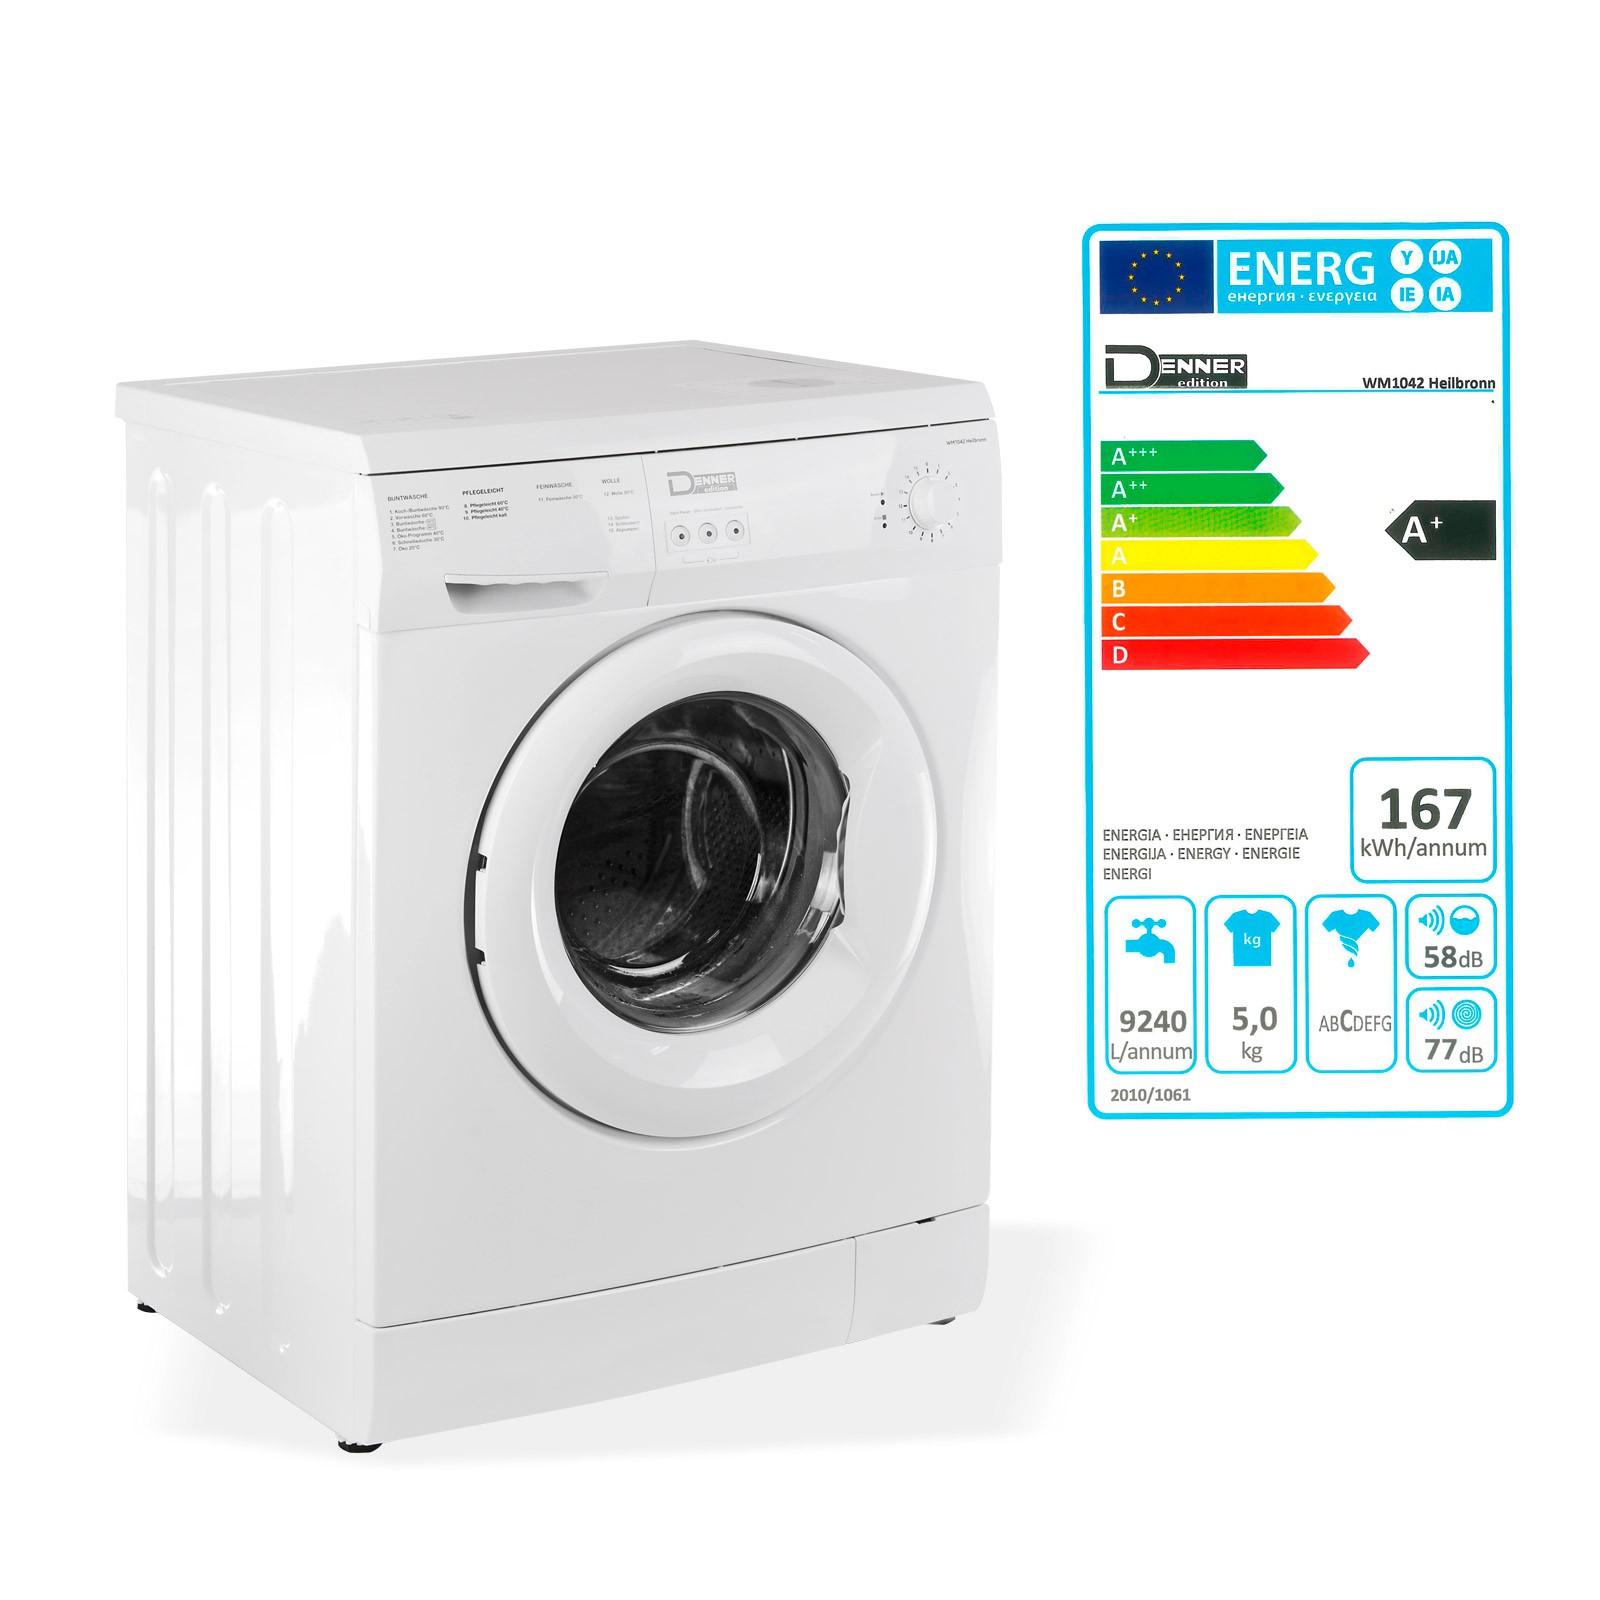 gorenje w5523 s waschmaschine fl a 5 kg 1200 upm wei senso care waschsystem led. Black Bedroom Furniture Sets. Home Design Ideas